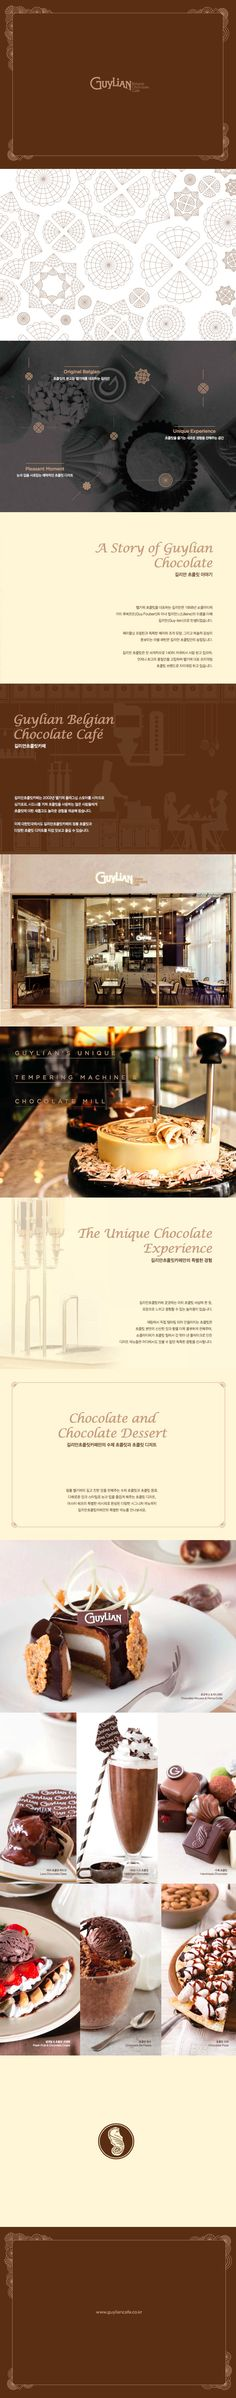 [Brand] Guylian Begium Chocolate Cafe [Client] Lotte Confectionary [Project Scope] Brand Concept, BI Visual Style, Application Design, Store Identity & Guide, Menu Recipe & Styling, Brand Launching Program(Store Photography, Menu Photography, Launching Package Design, Brand Brochure, Leaflet, Brand Movie, Homepage, MD Product Design, VMD)   stonebc.com  #brand #branding #agency #stone #place #store #chocolate #cafe #coffee #creative #interior #design